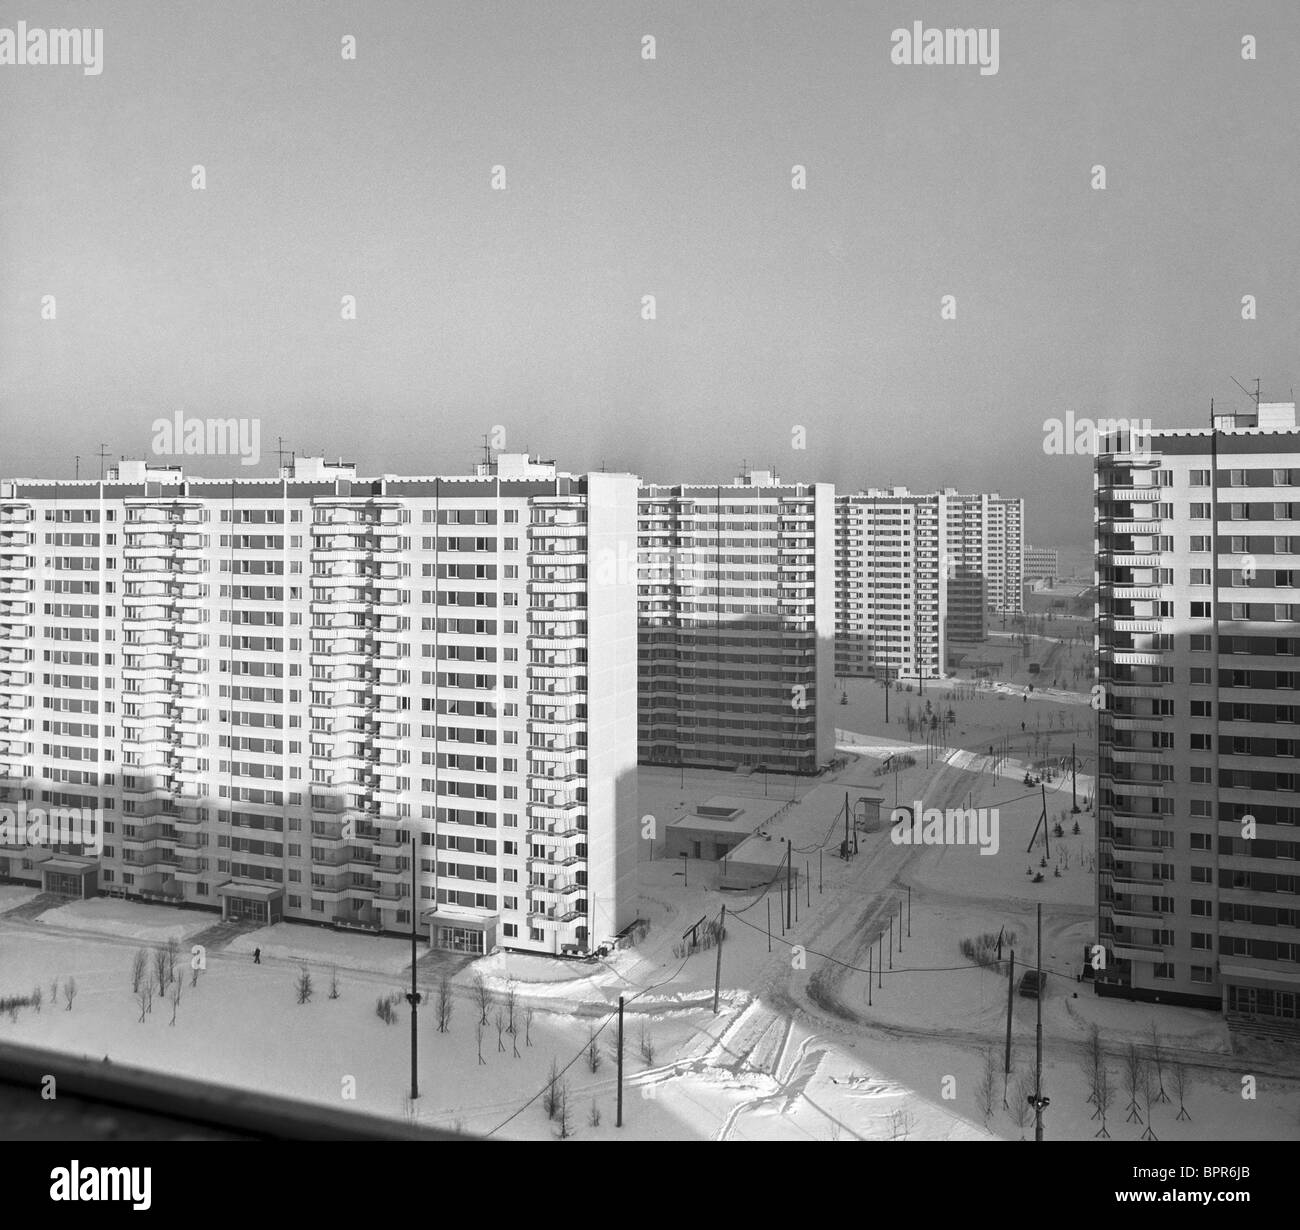 Olympic village, 1980 - Stock Image